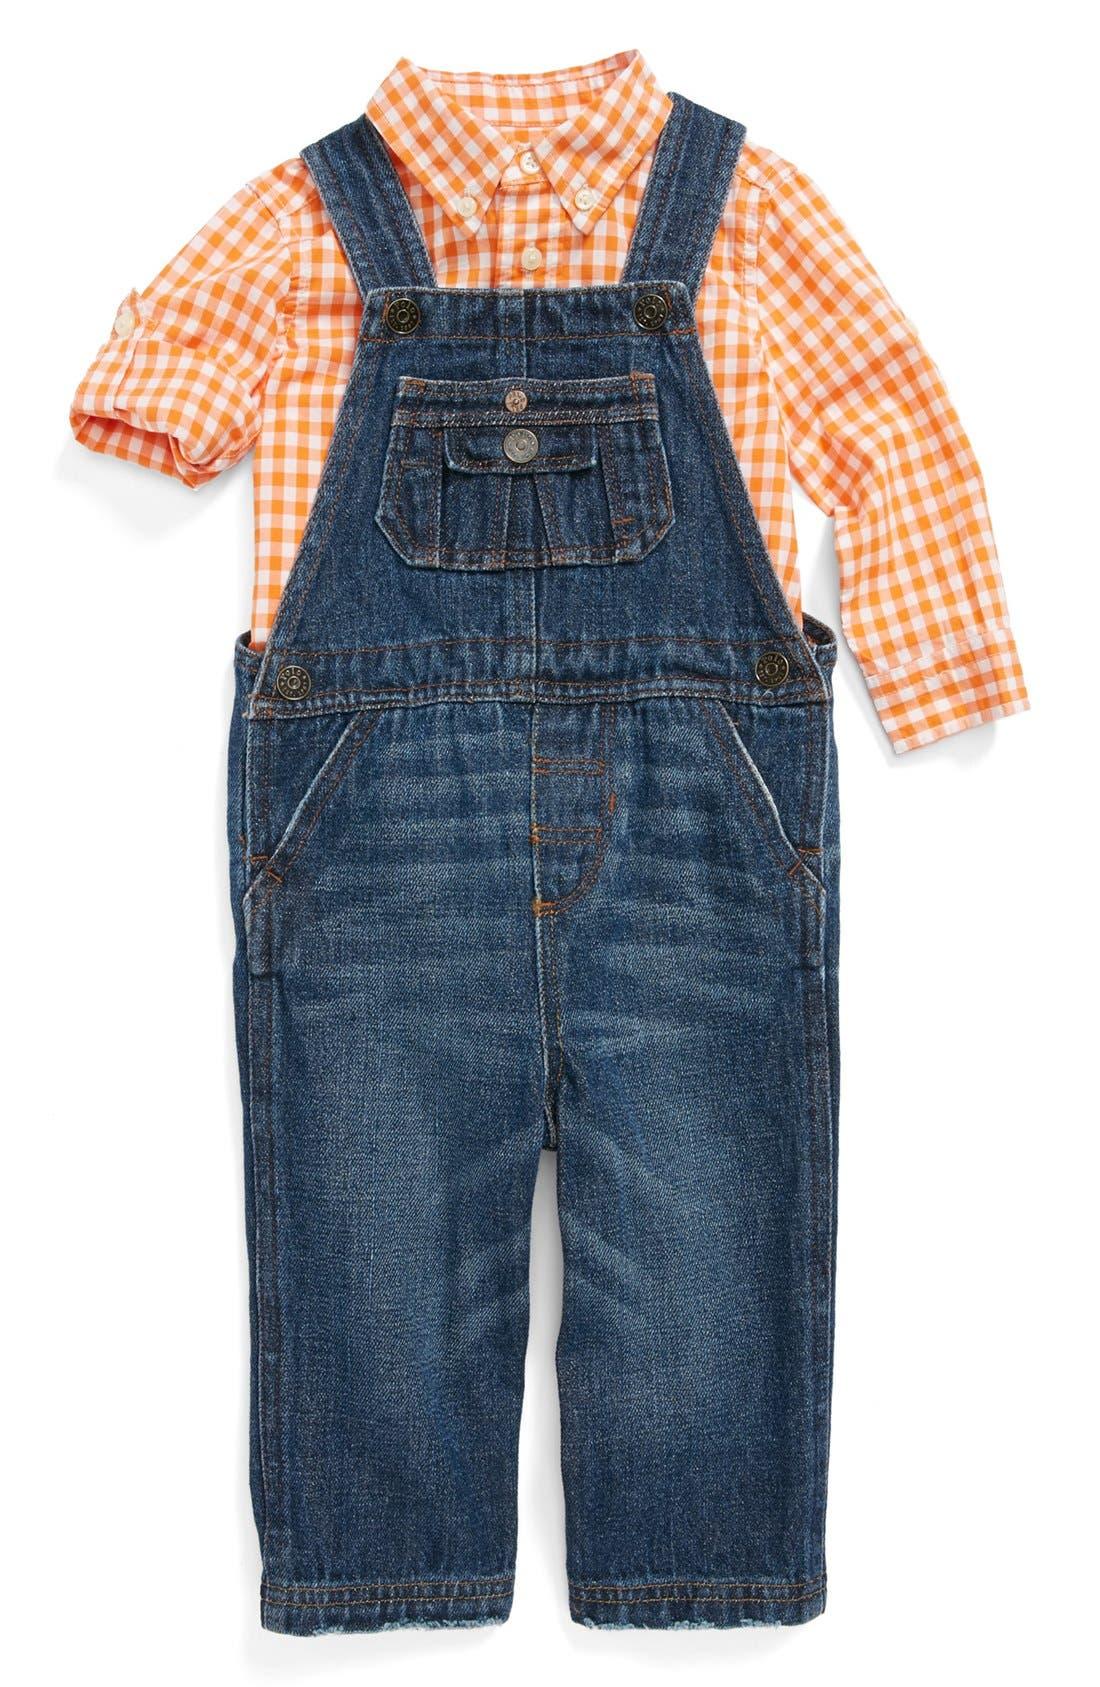 Alternate Image 1 Selected - Ralph Lauren Woven Check Shirt & Denim Overalls (Baby Boys)